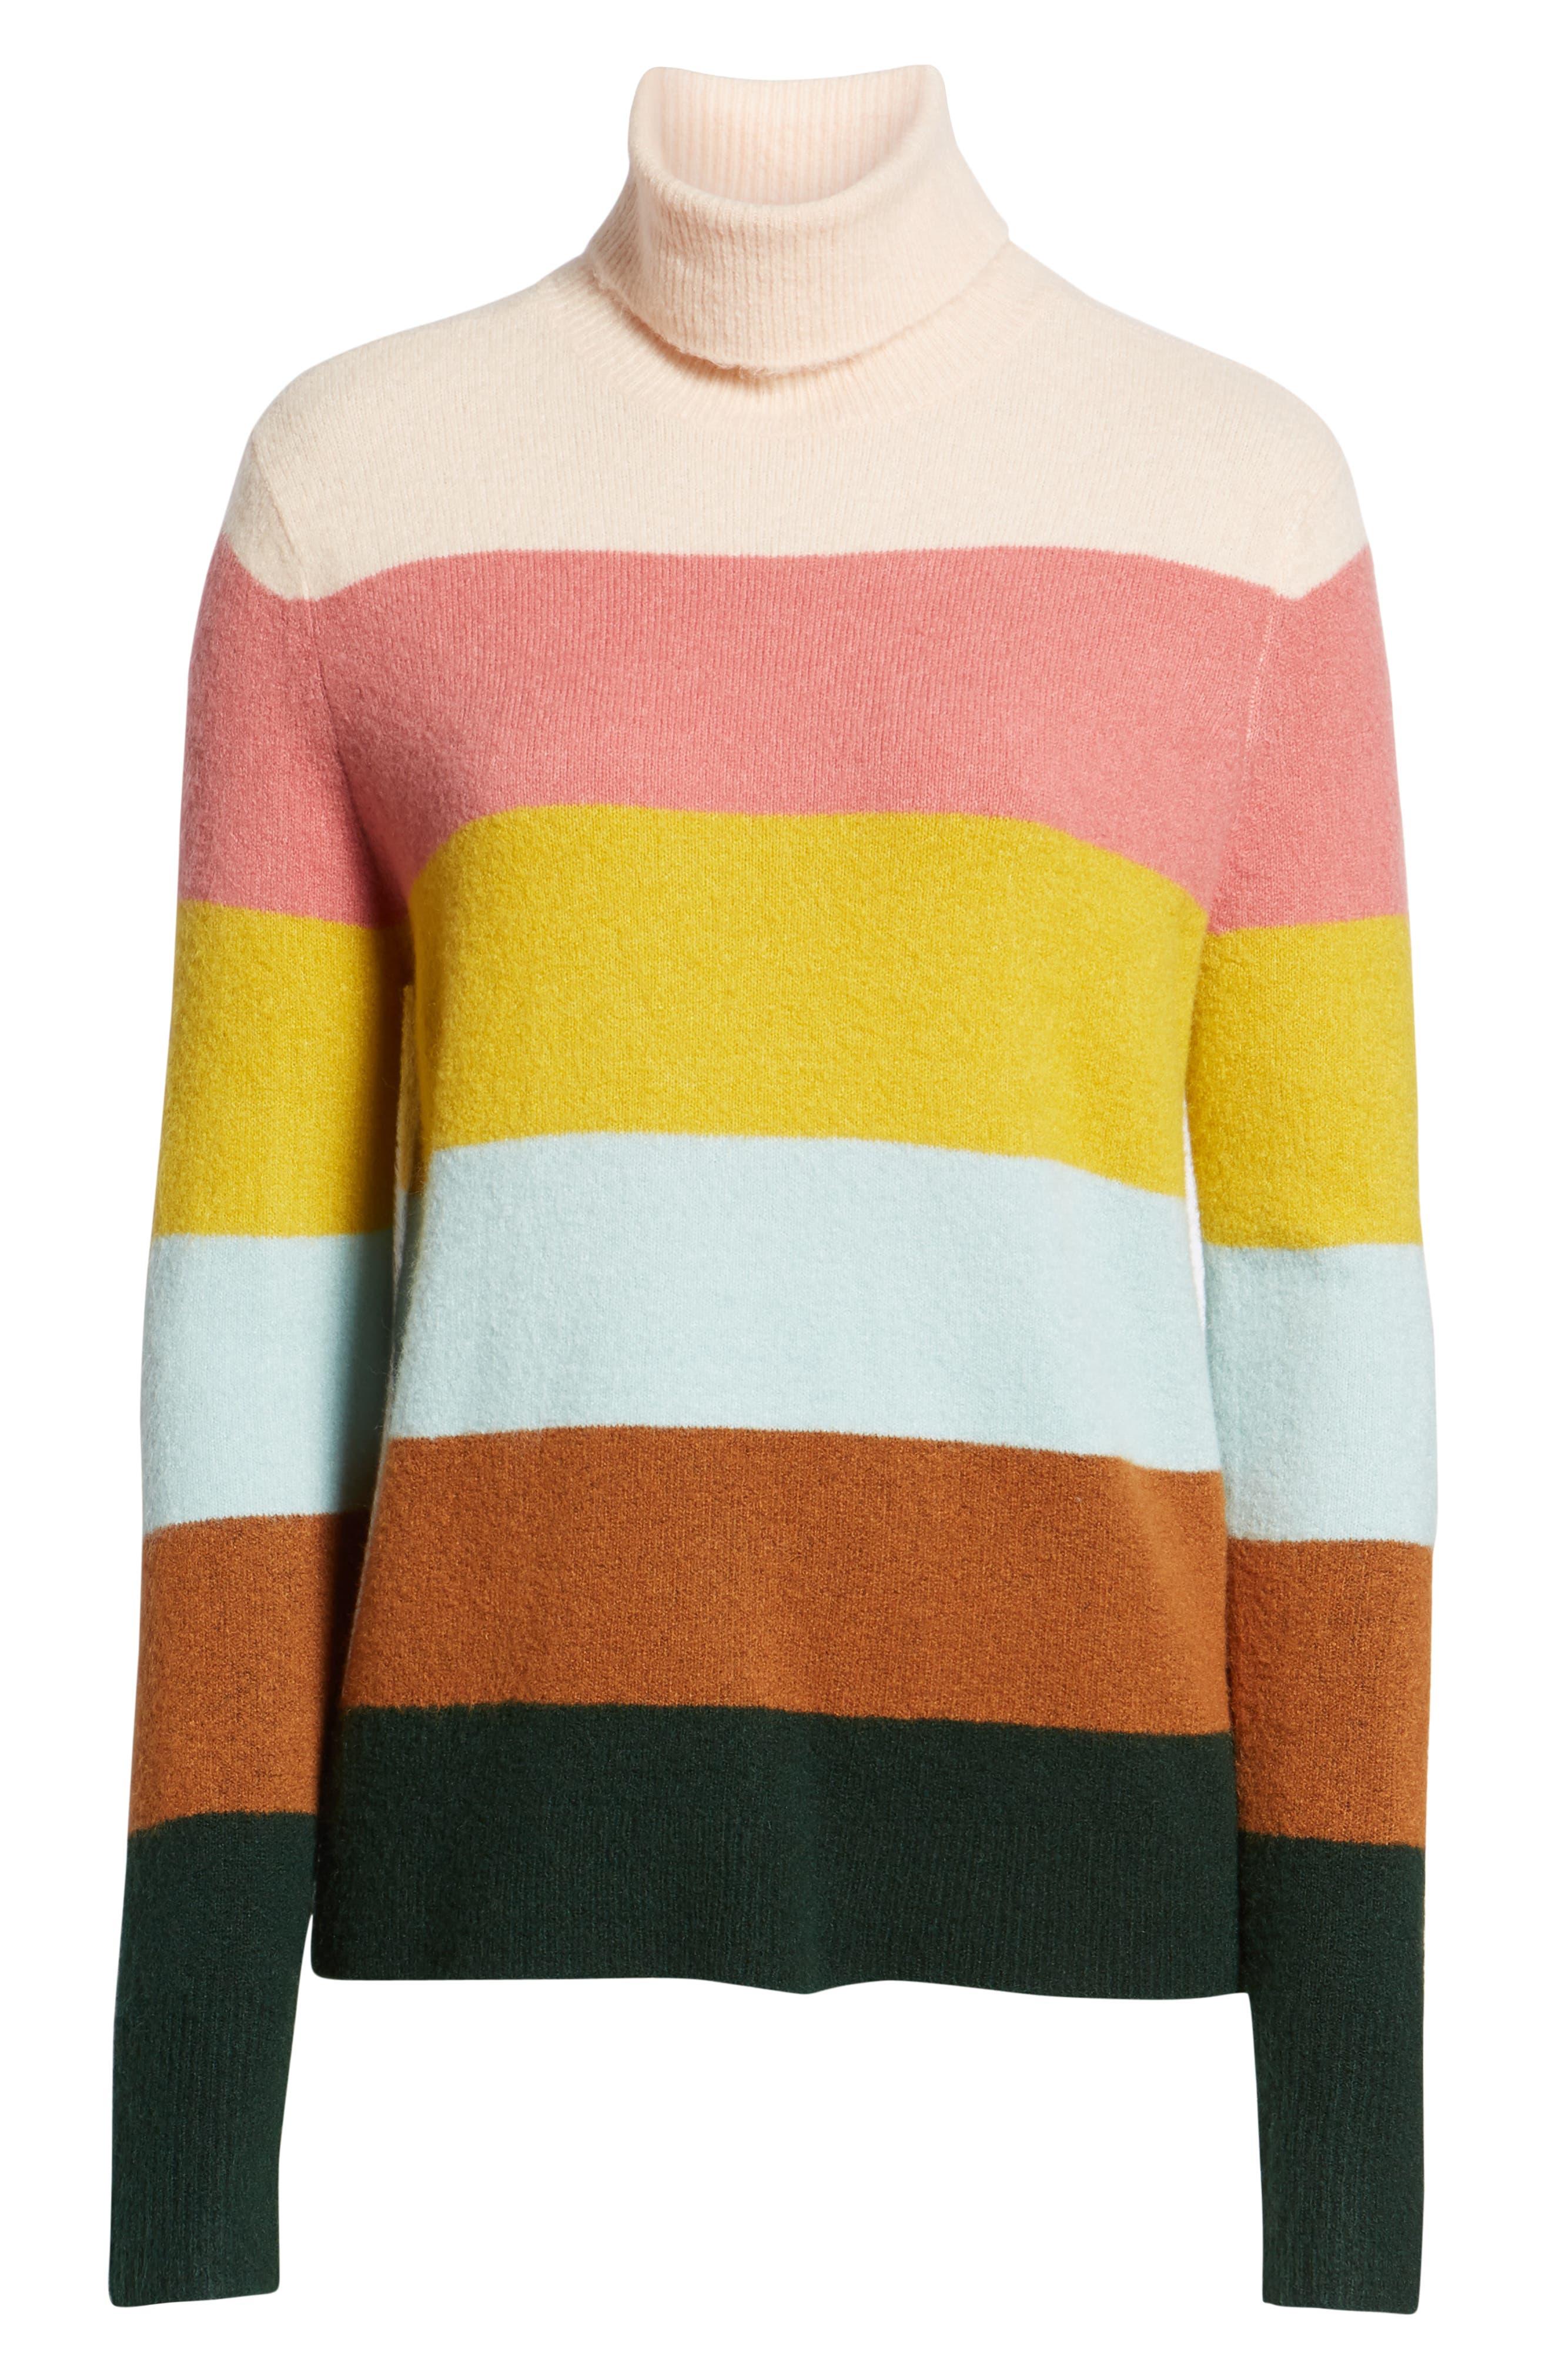 x Atlantic-Pacific Stripe Turtleneck Sweater,                             Alternate thumbnail 7, color,                             PINK MULTI STRIPE